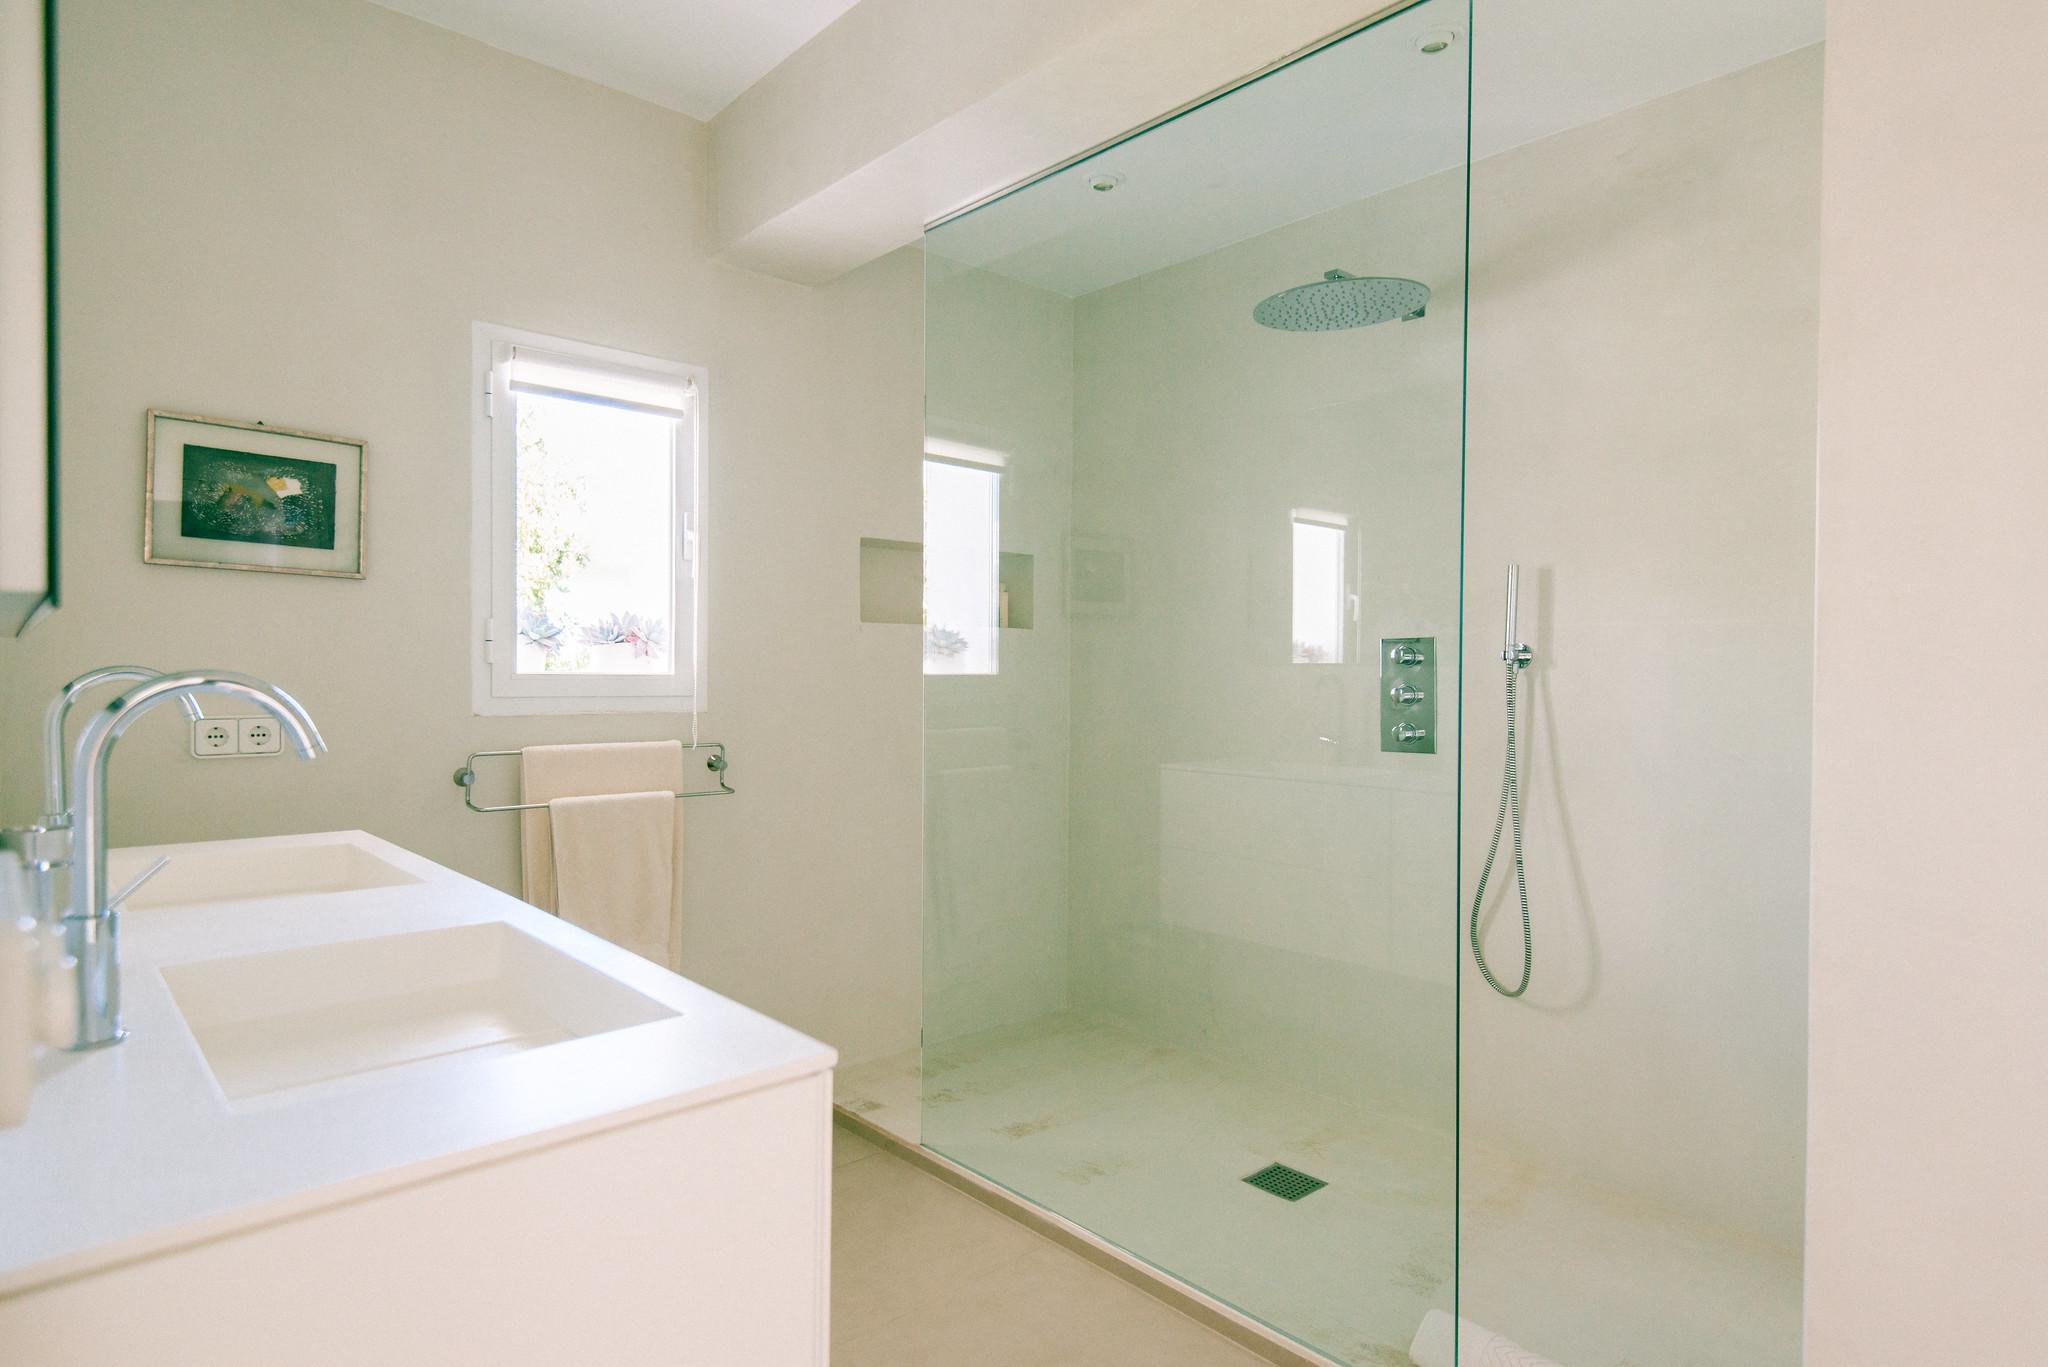 https://www.white-ibiza.com/wp-content/uploads/2020/06/white-ibiza-villas-casa-odette-interior-bathroom.jpg